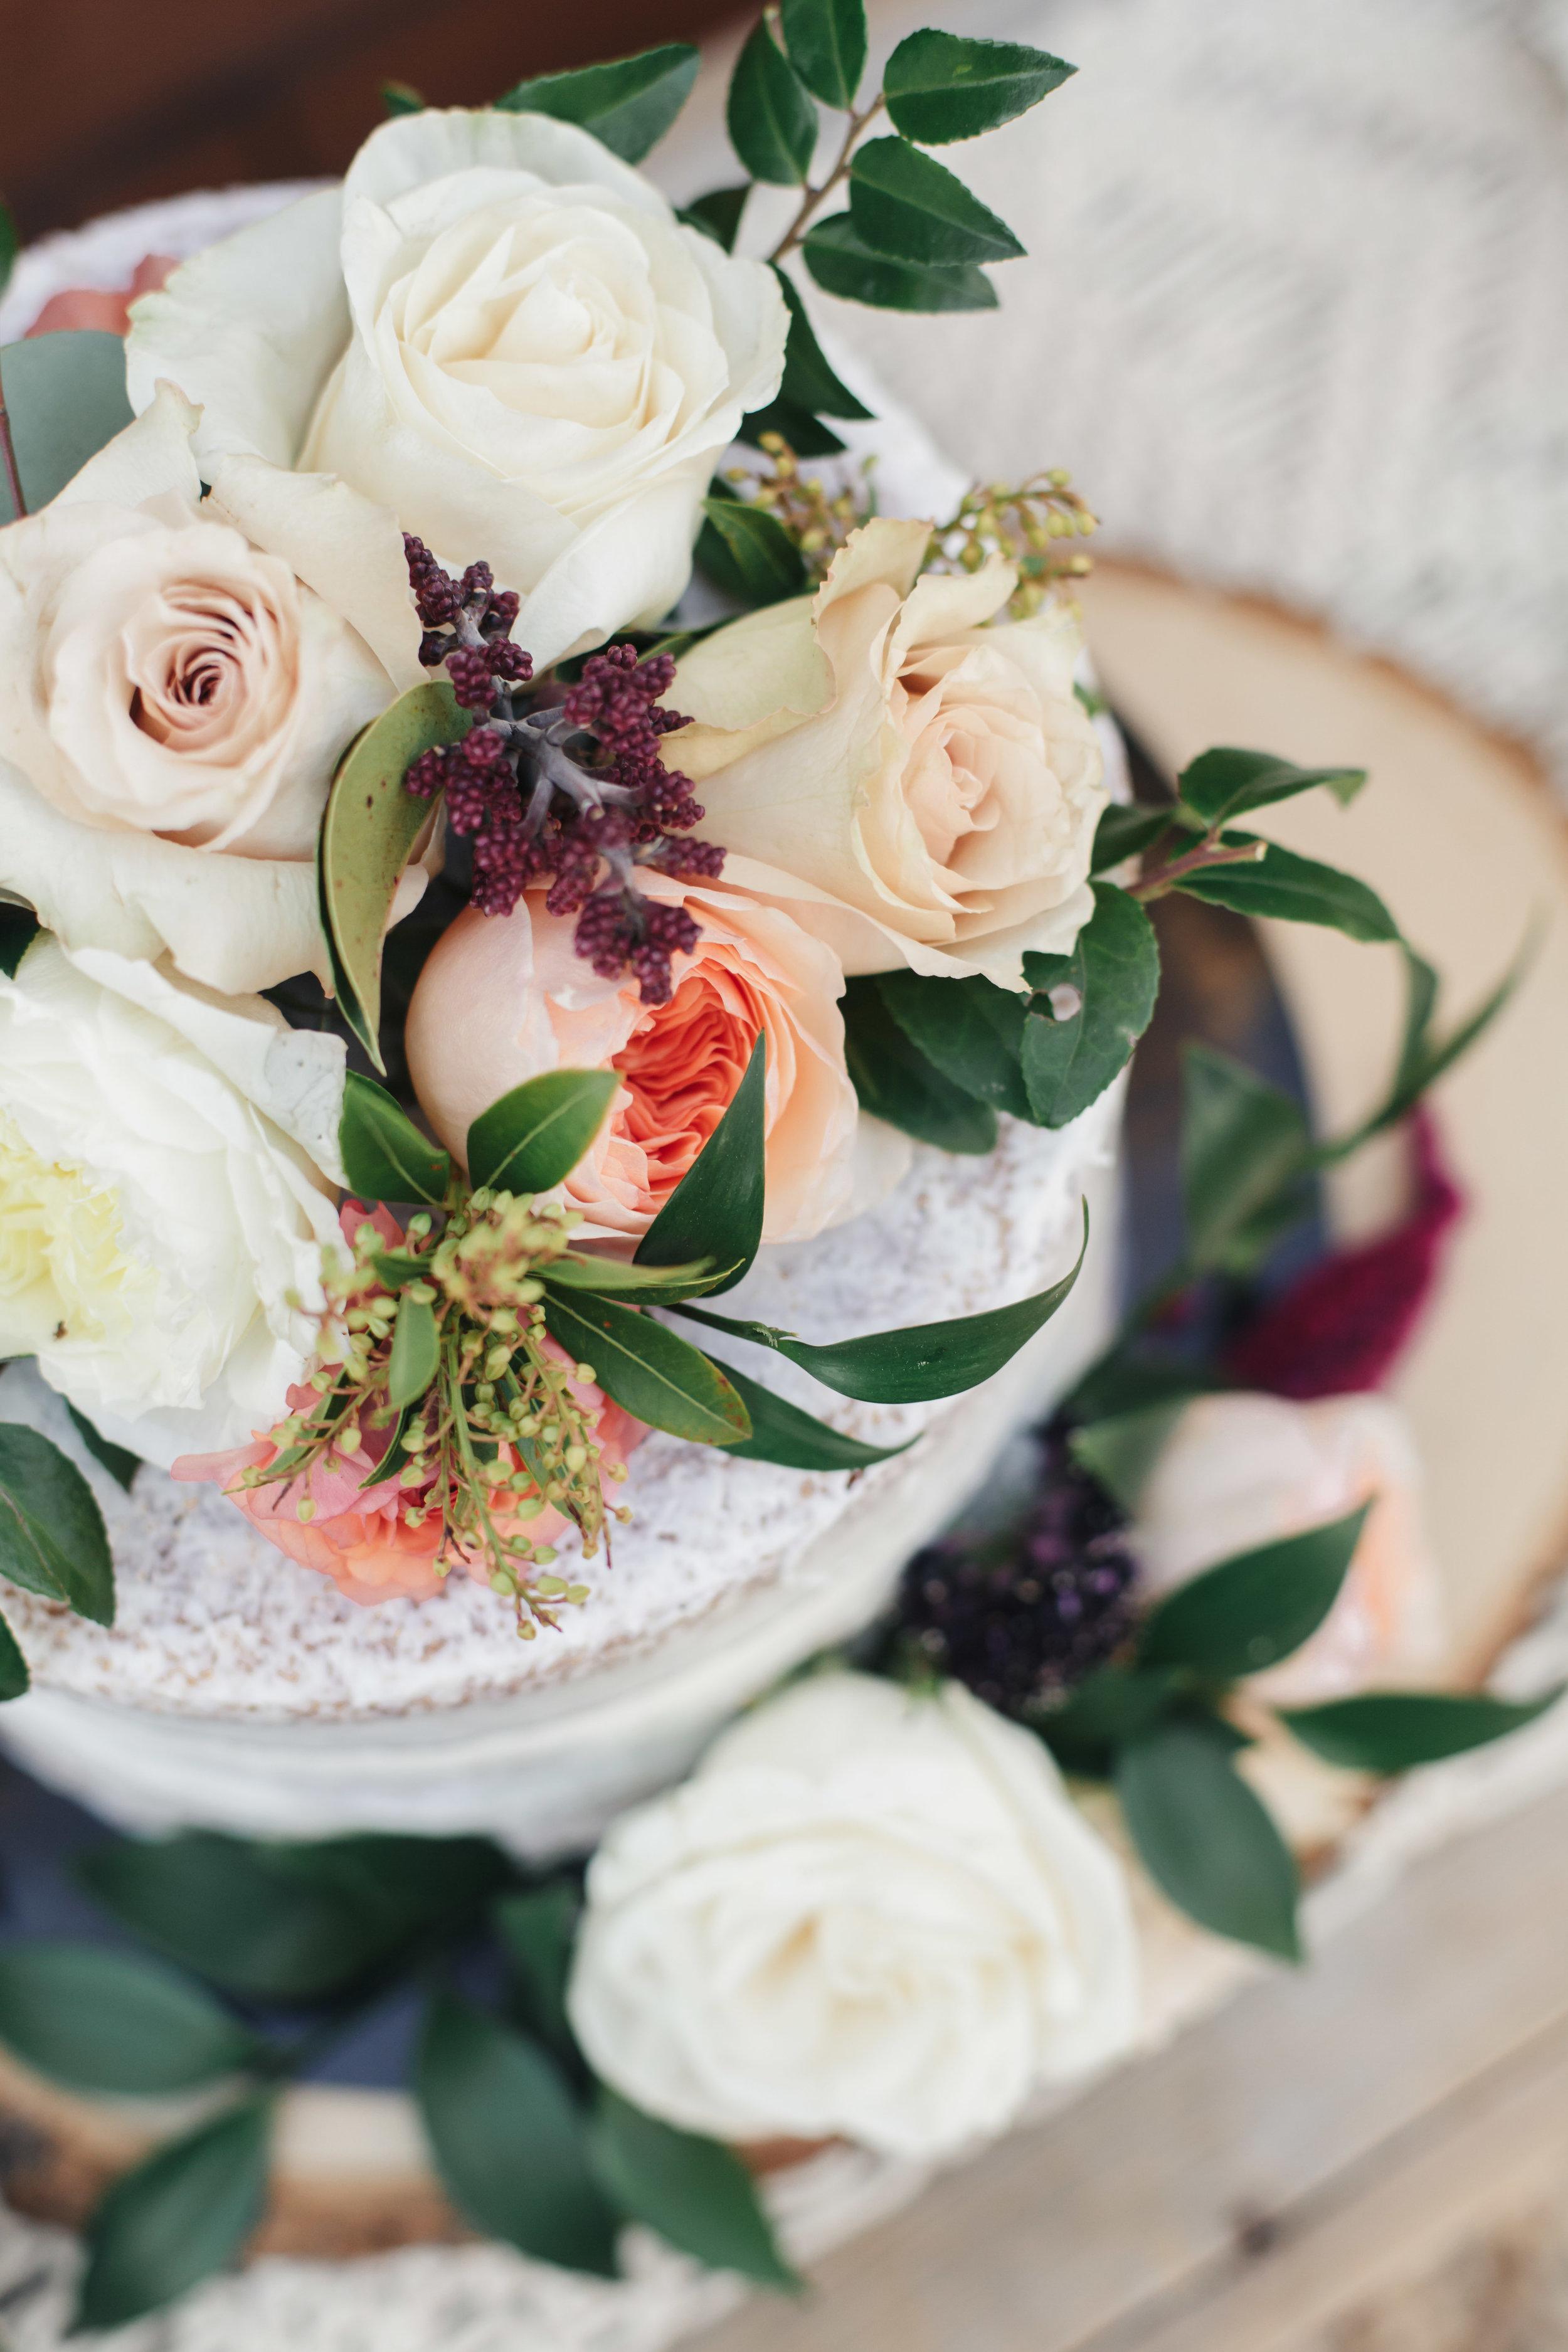 www.santabarbarawedding.com   Molly + Co   Sogno Del Fiore   Wedding Cake